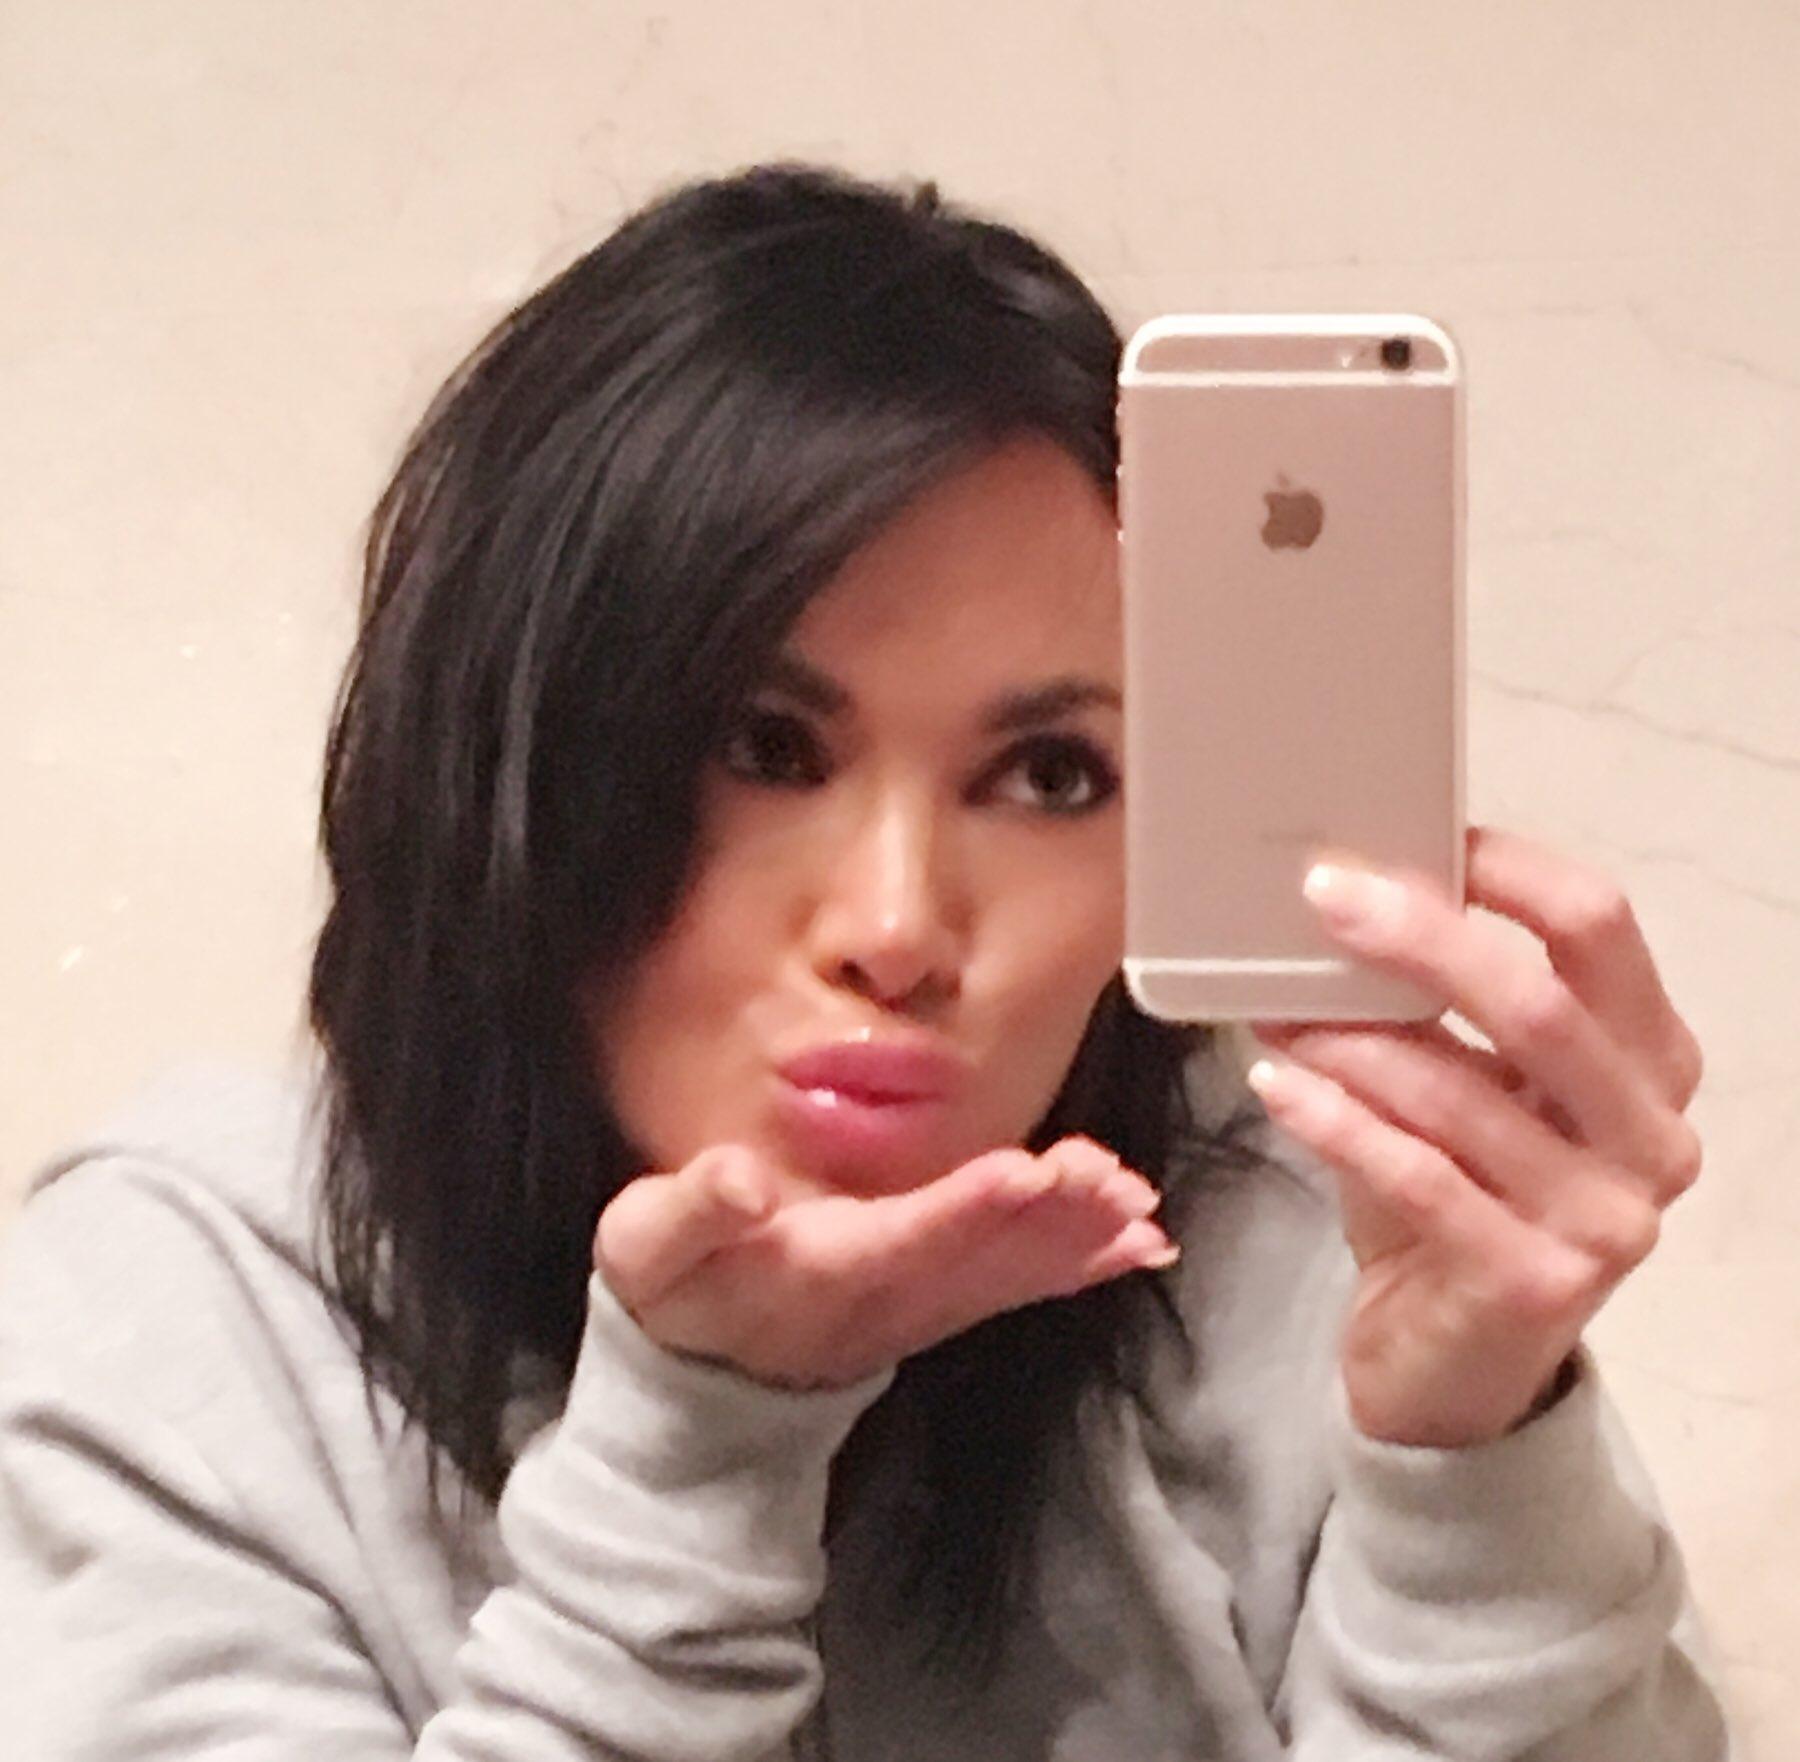 Selfie Danni Levy nude photos 2019